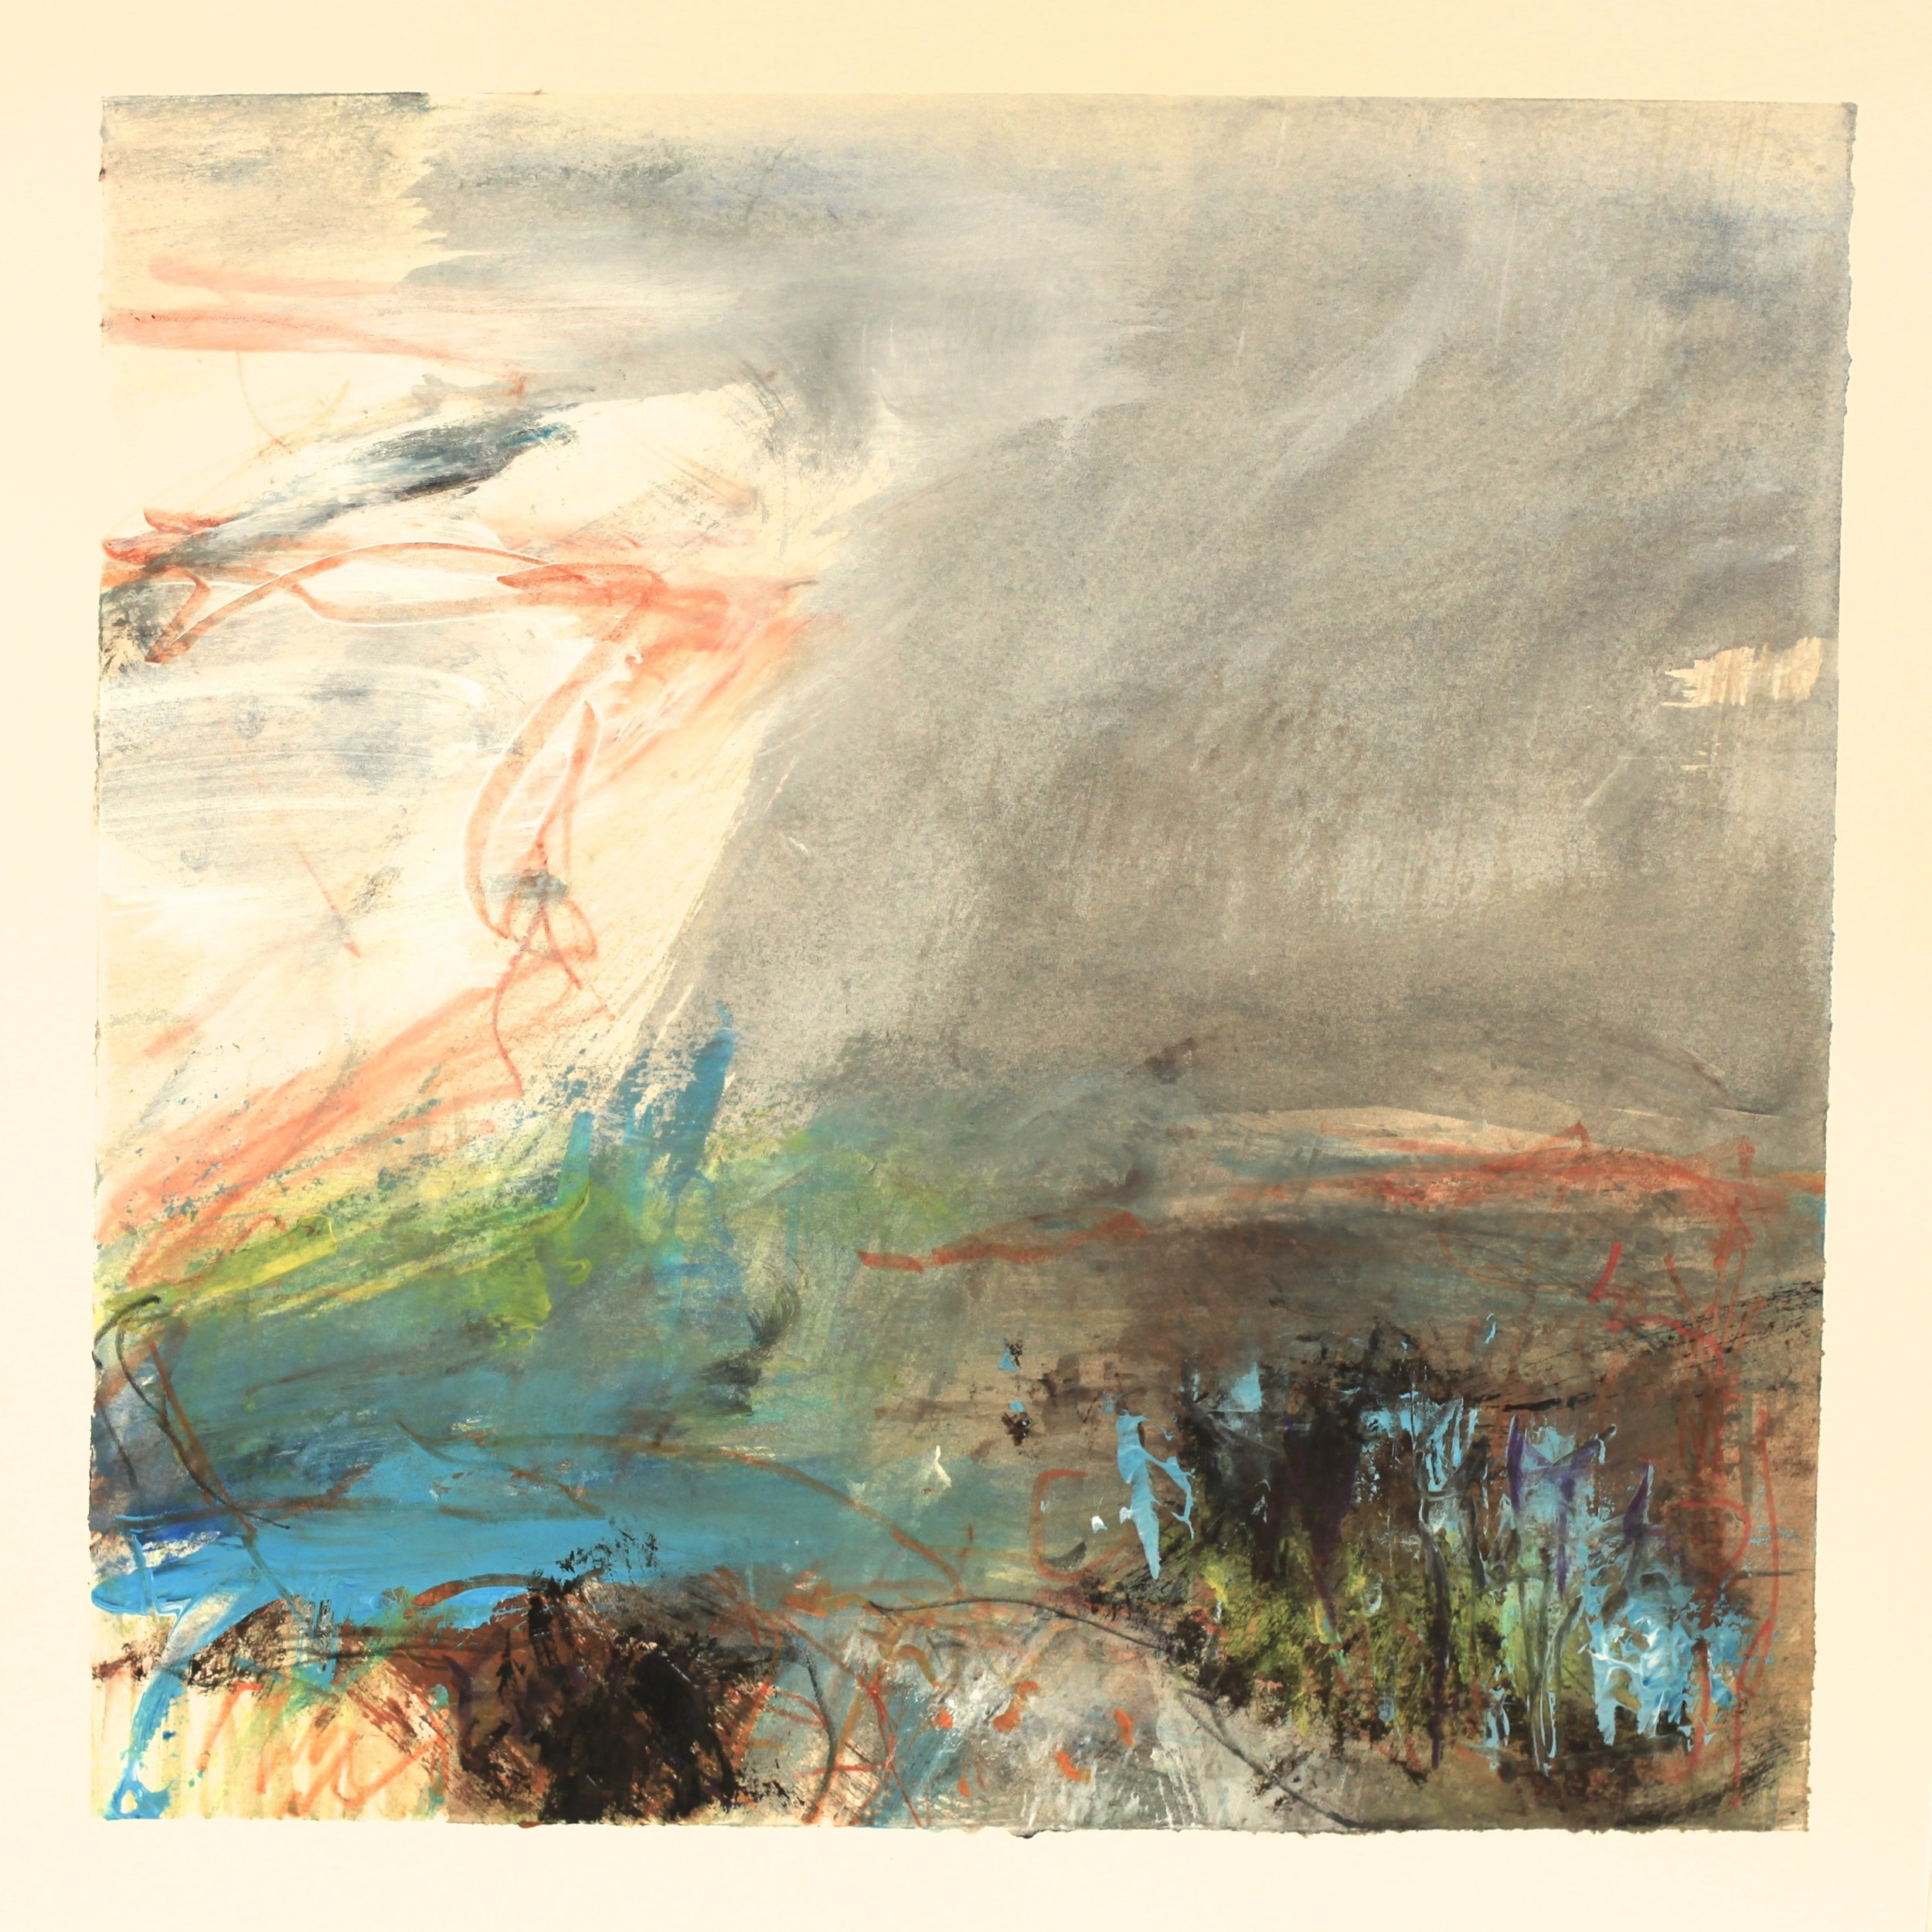 Water's edge, watercolour, 28 x 28cm